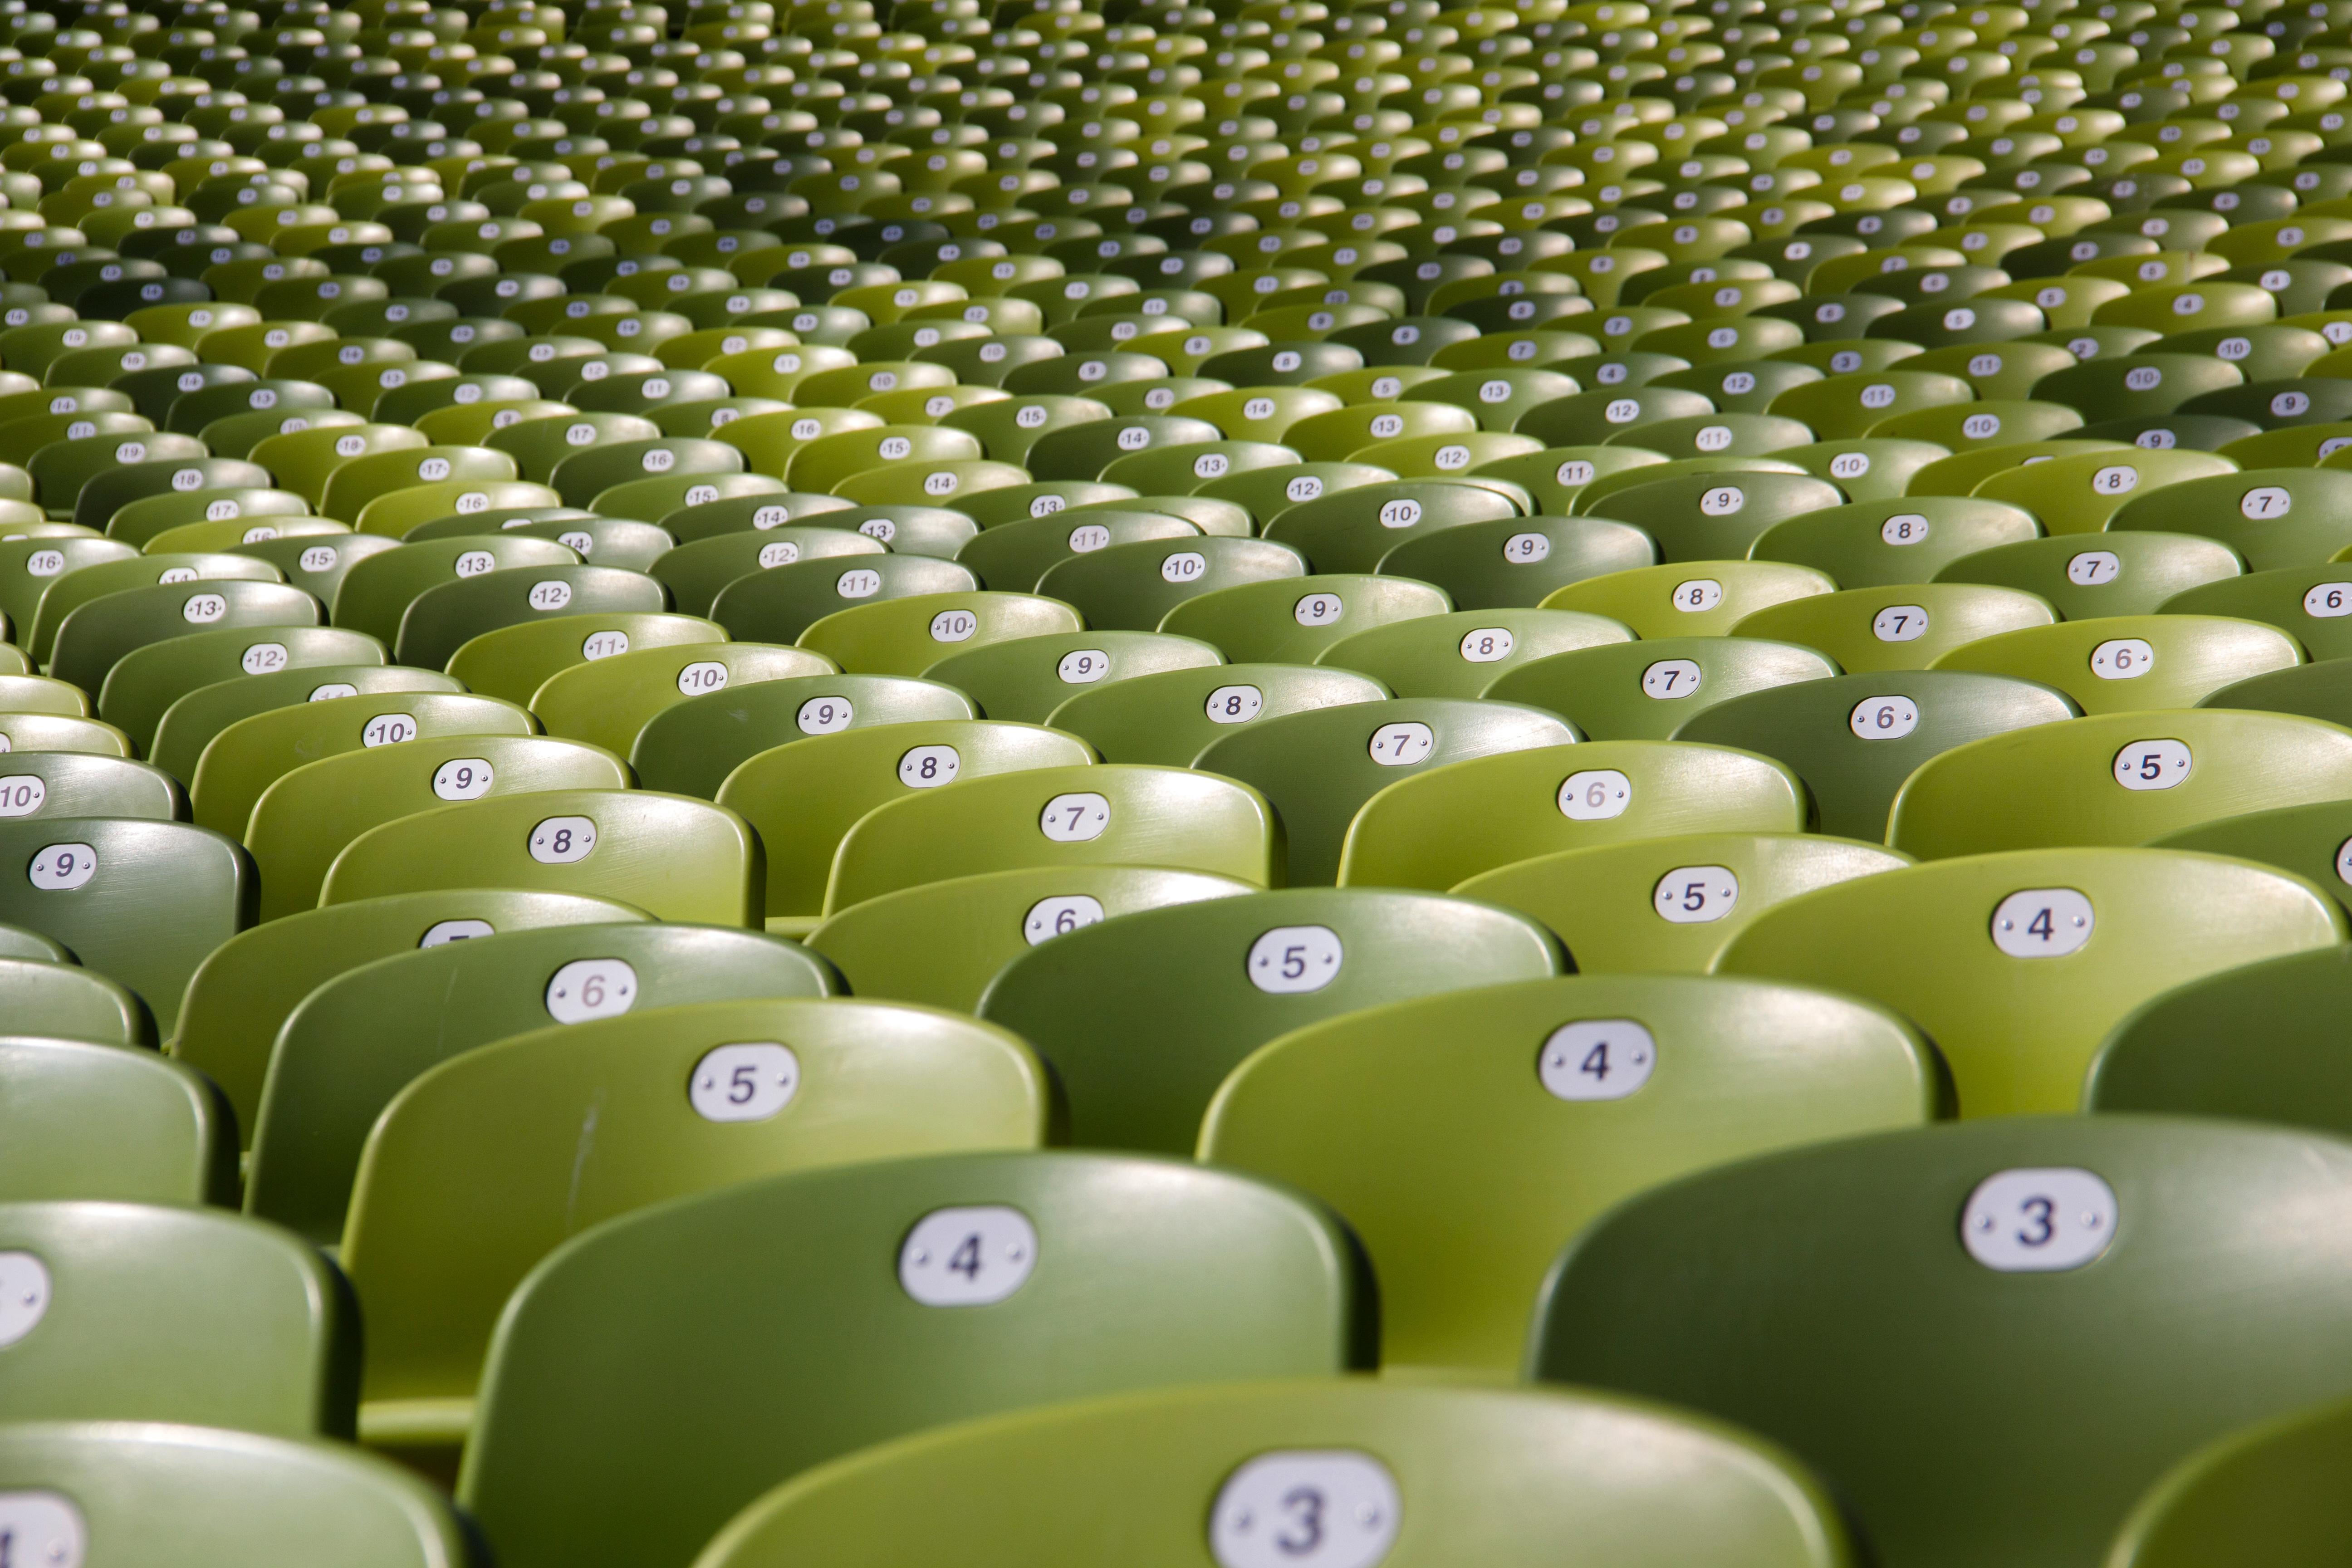 Free grass chair seat number green stadium circle